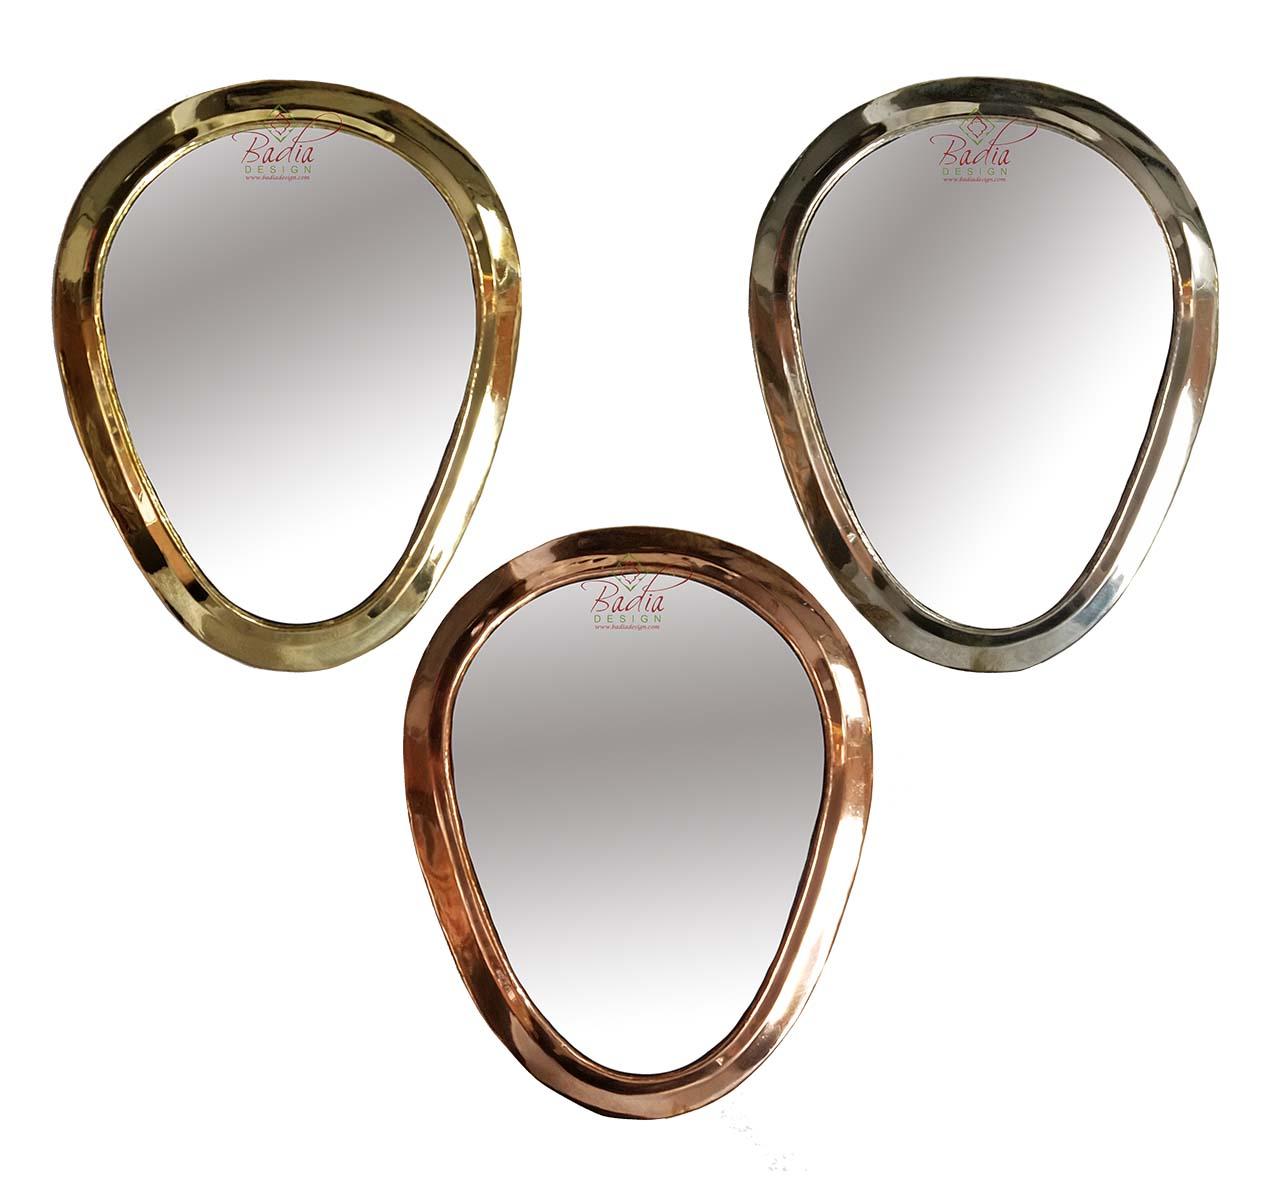 moroccan-teardrop-shpaed-mirrors-m-em017.jpg